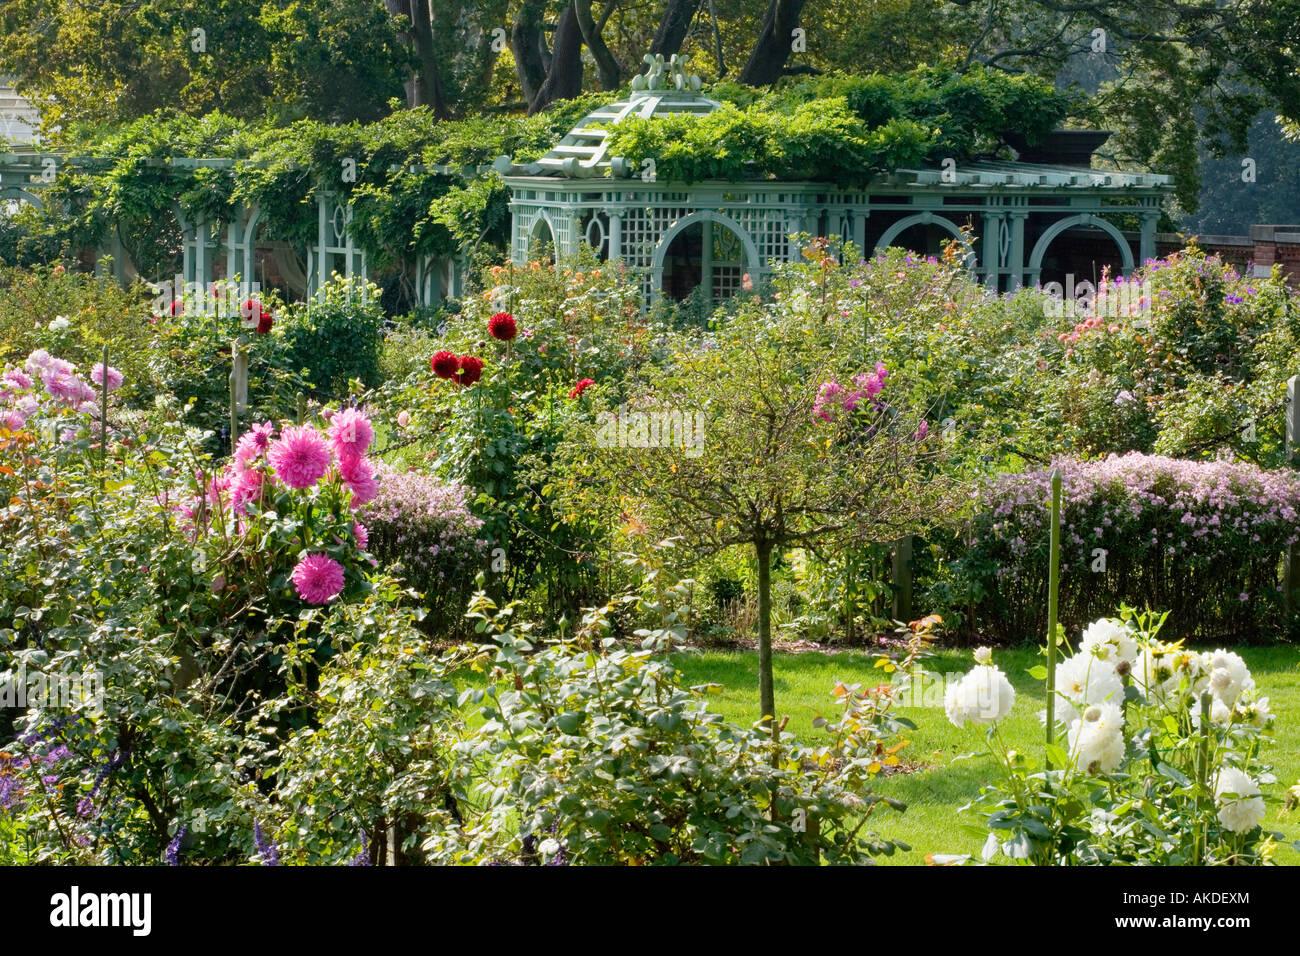 Old Westbury Gardens Finest English Garden In USA Nassau County Long Island  New York